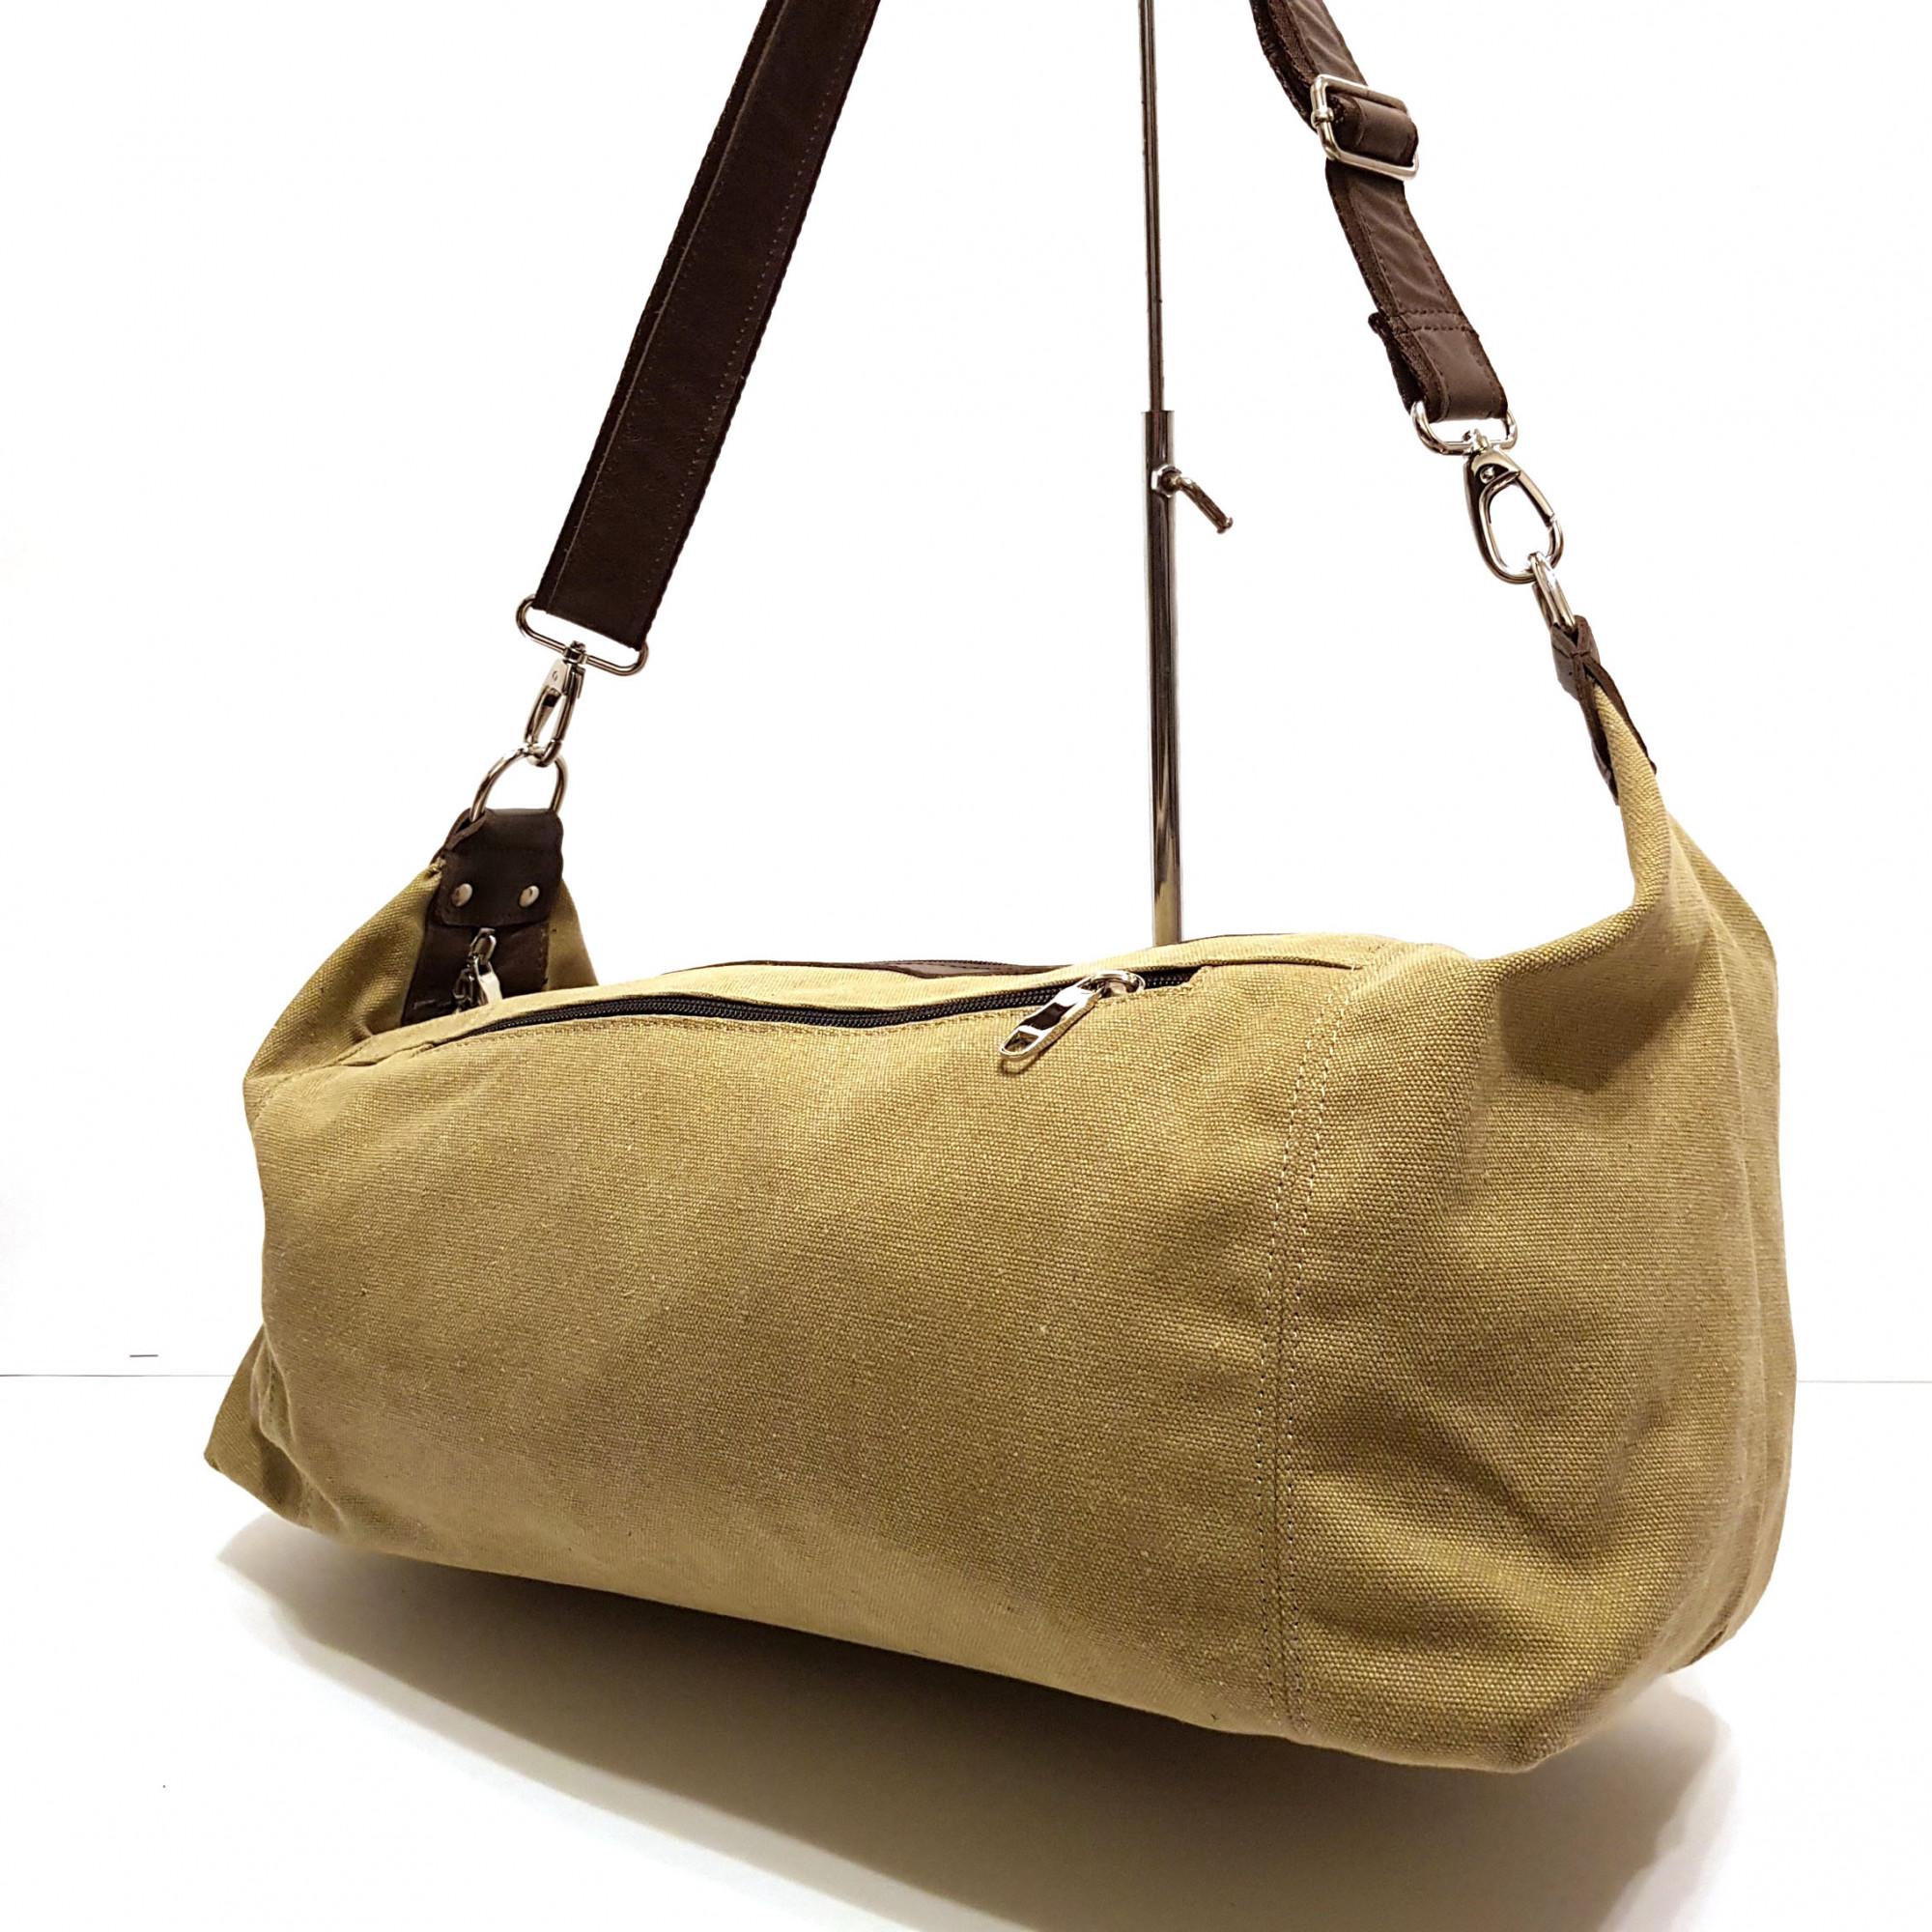 Мужская сумка из ткани Канвас+кожа арт.417